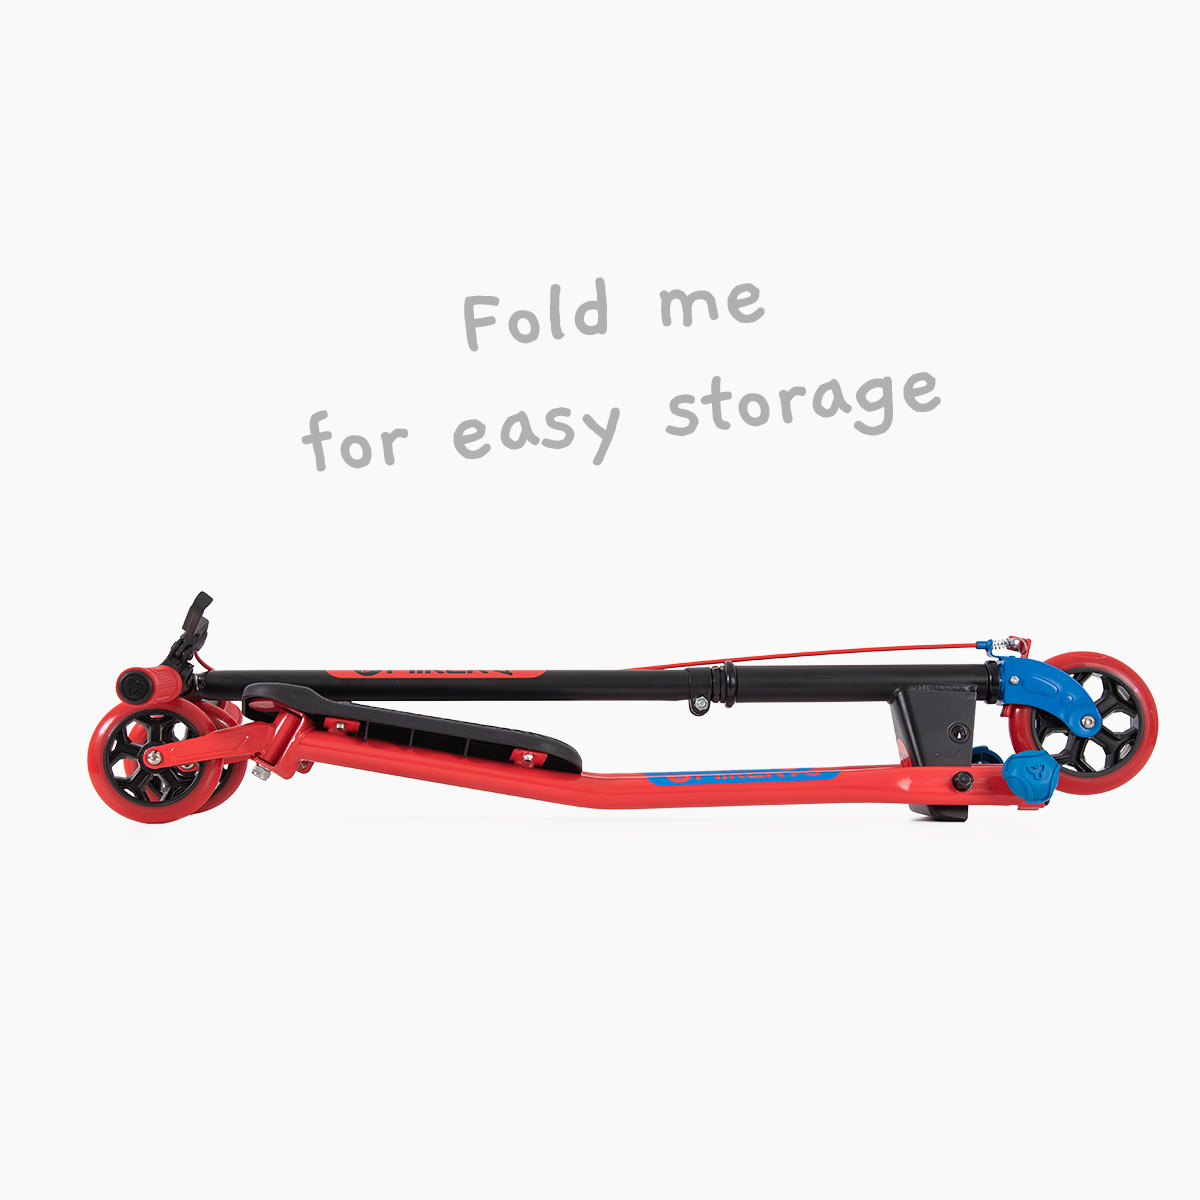 Folding system for storage